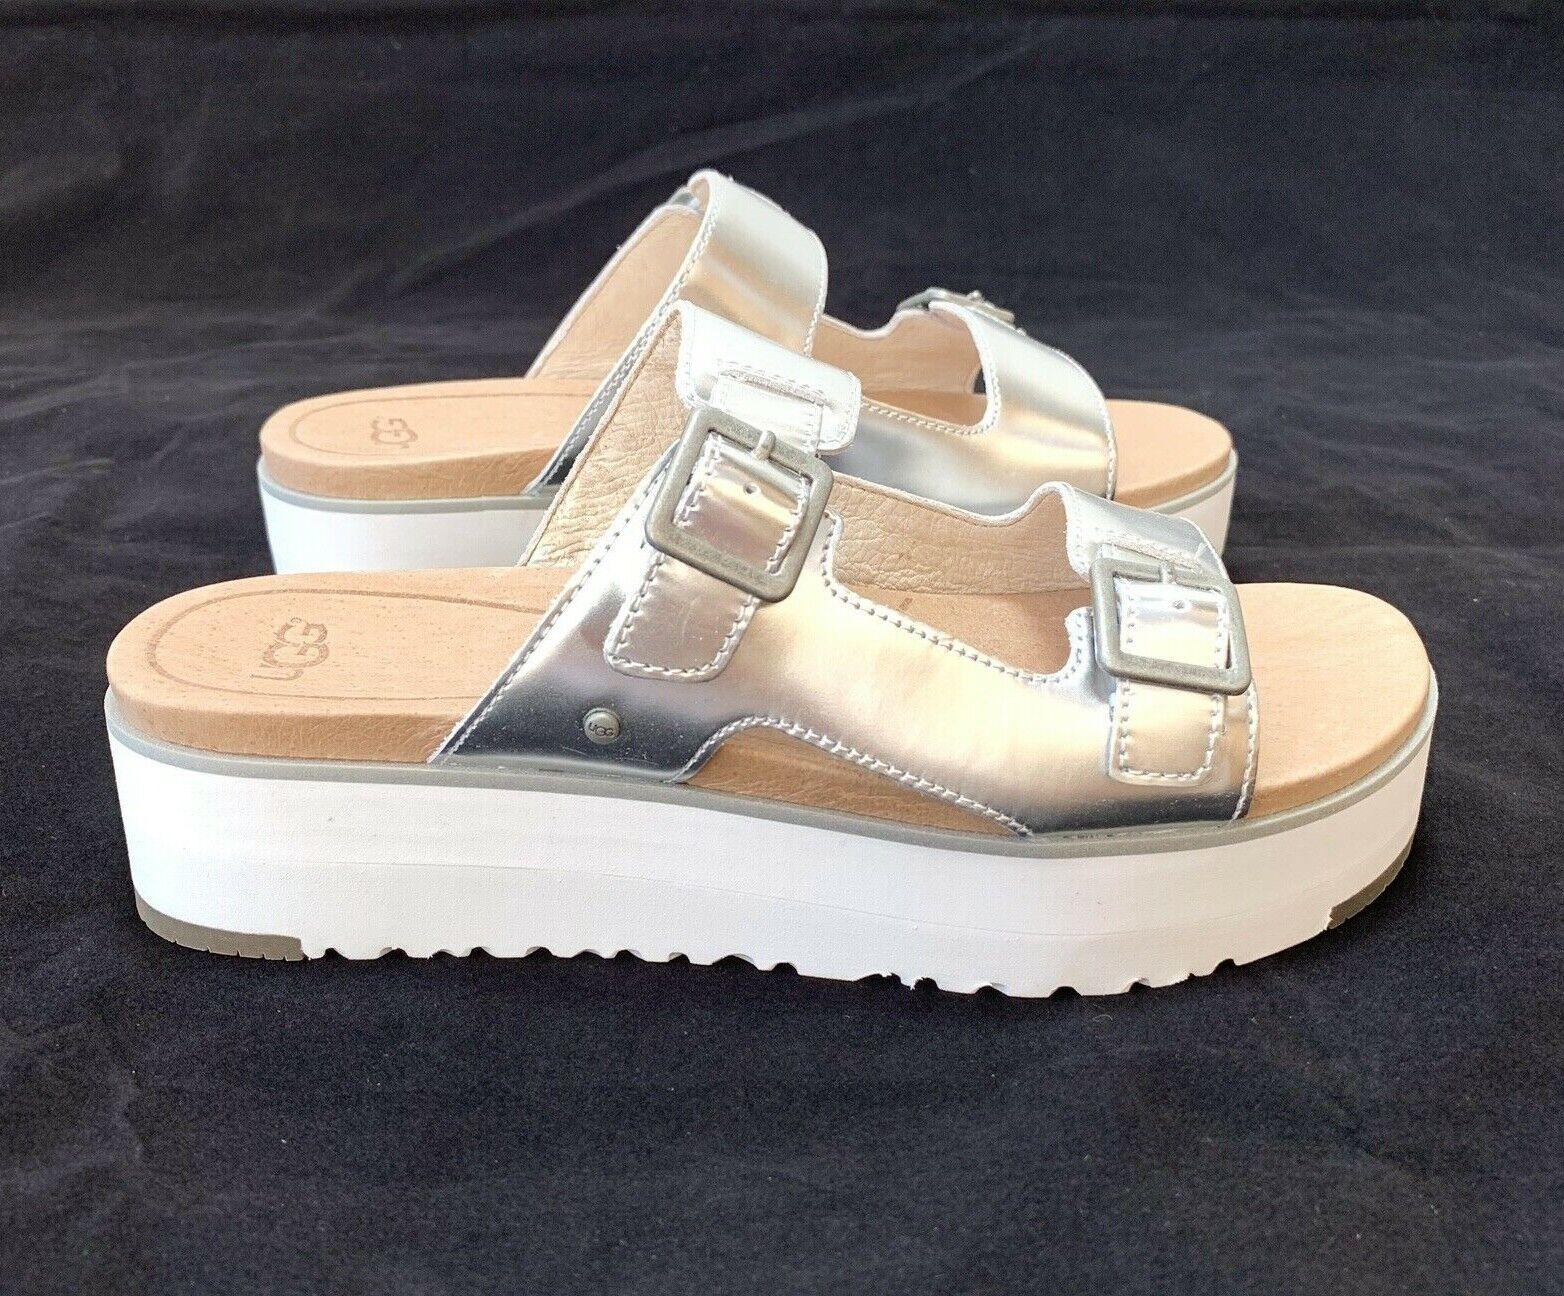 Ugg Women's Ardyne Metallic Silver Platform Wedges Flip Flop